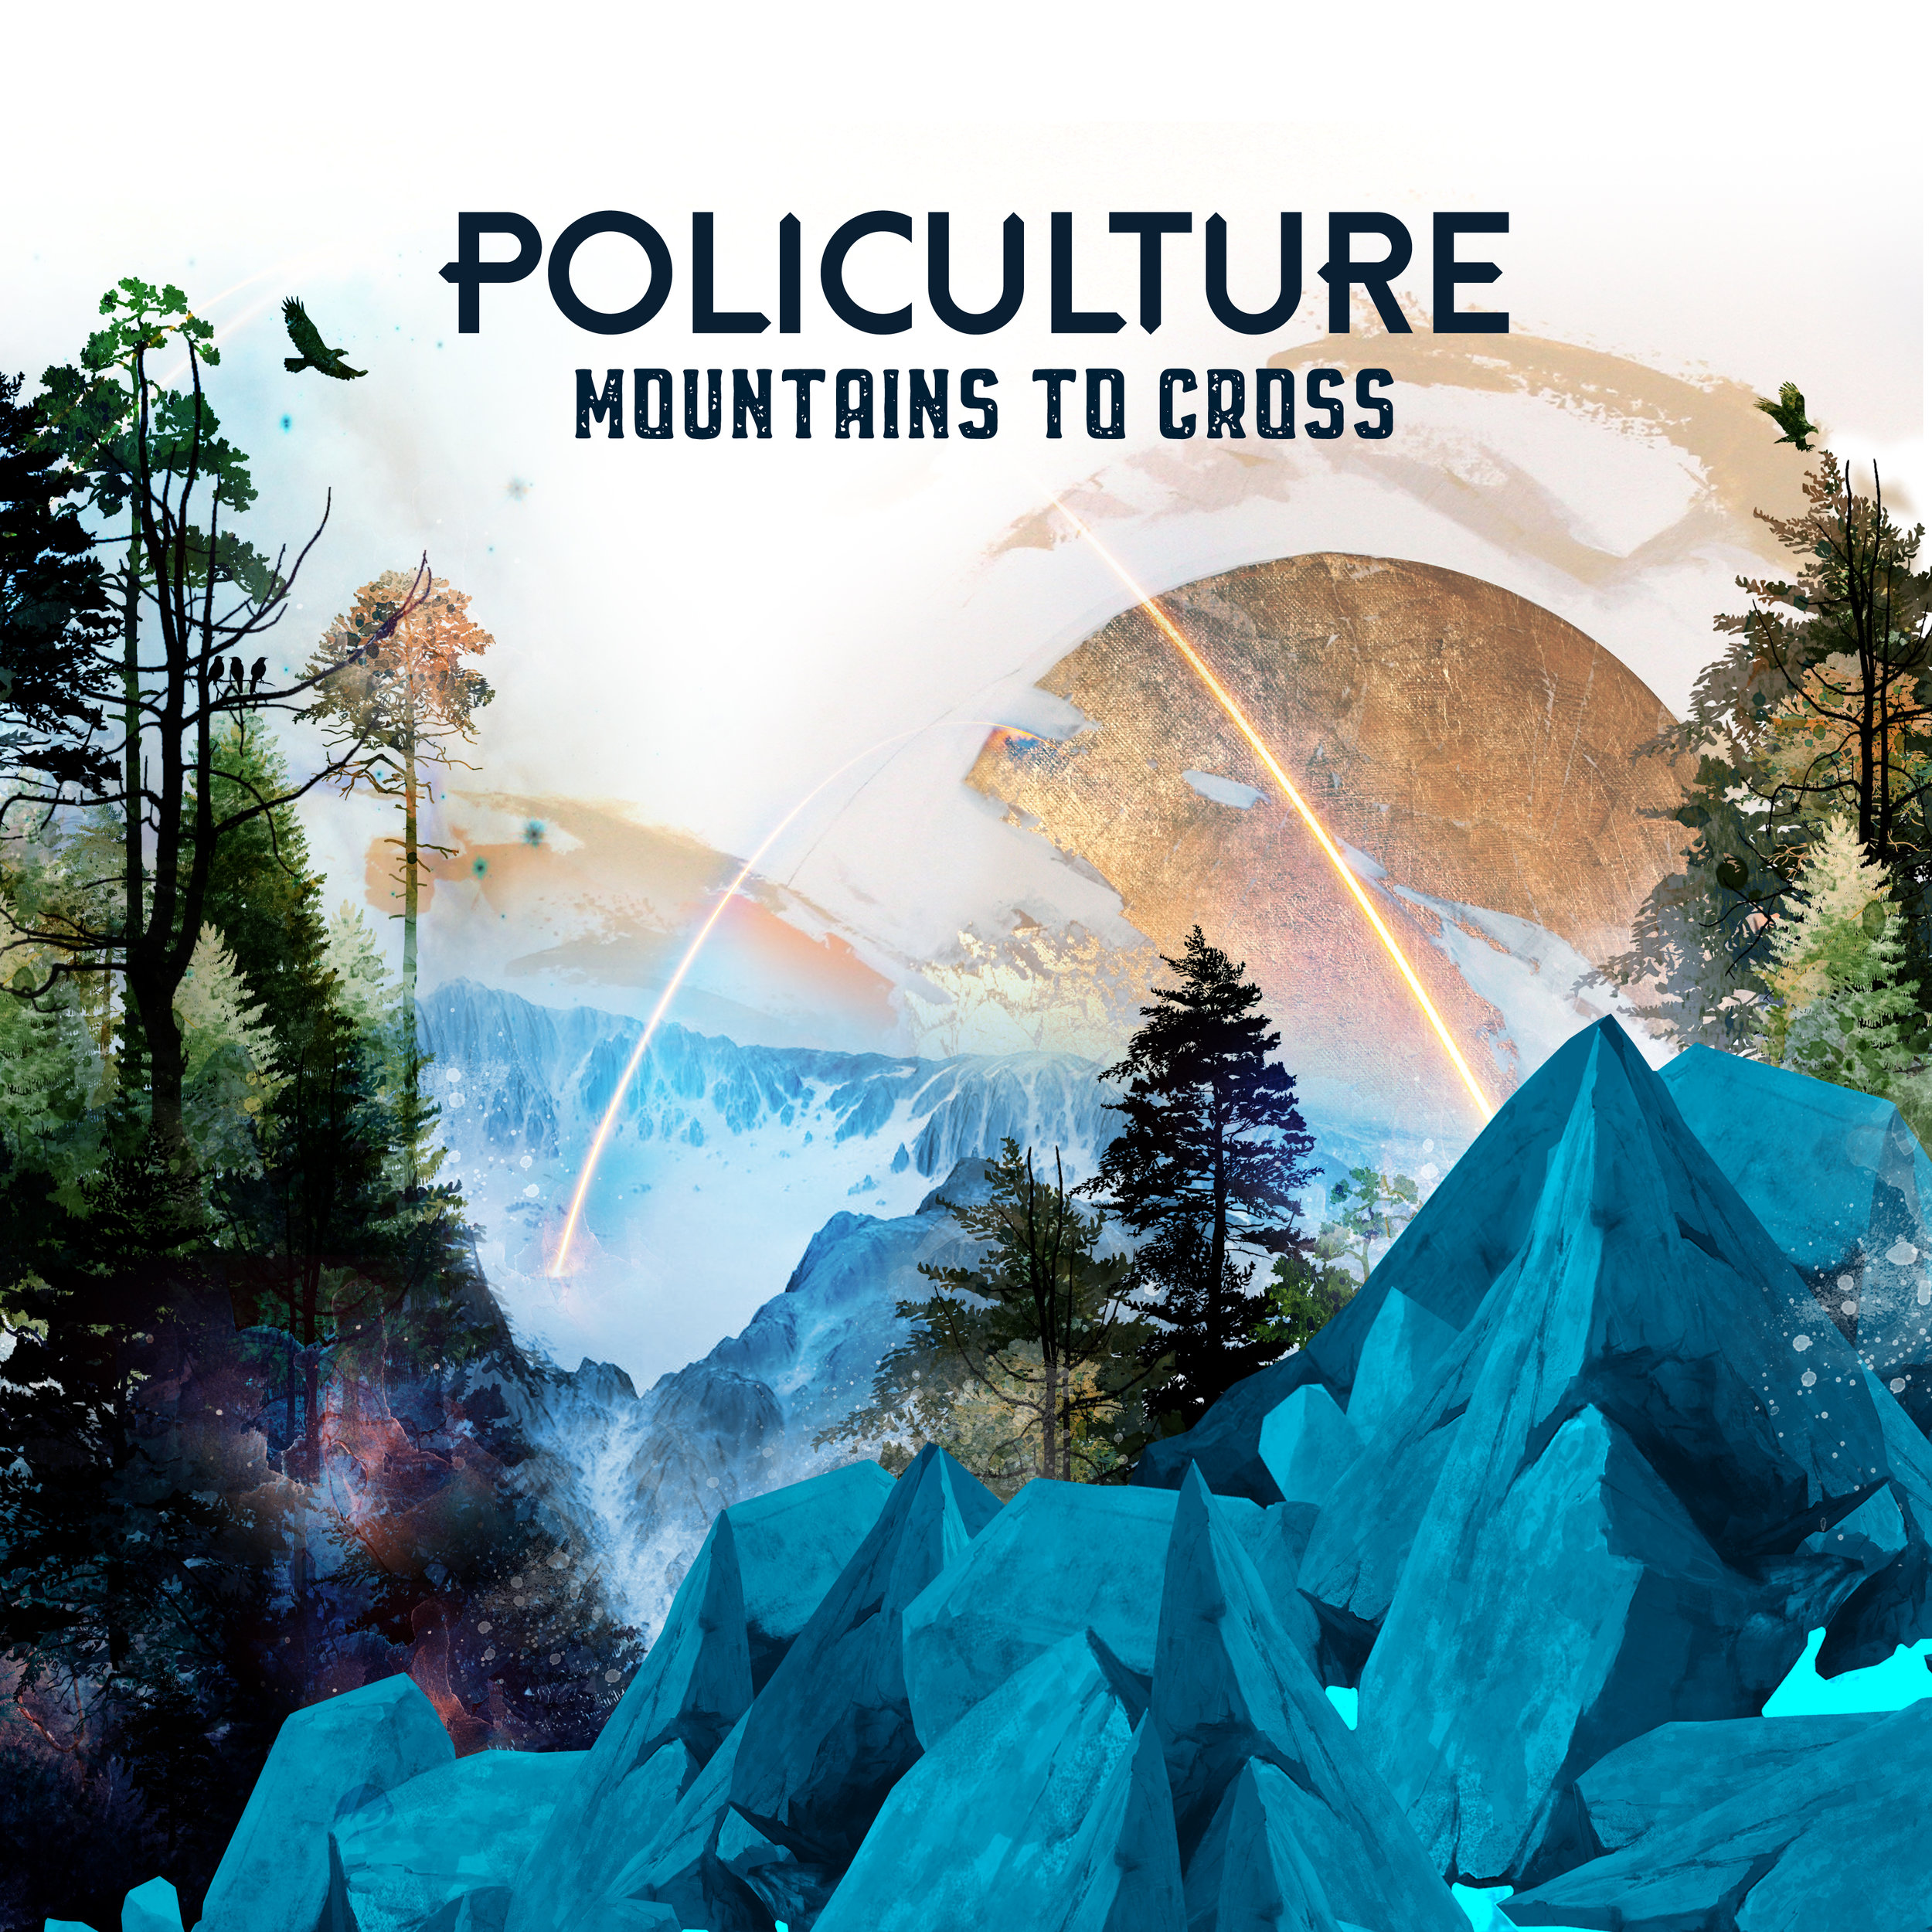 Policluture Album Cover 12x12_FINAL.jpg